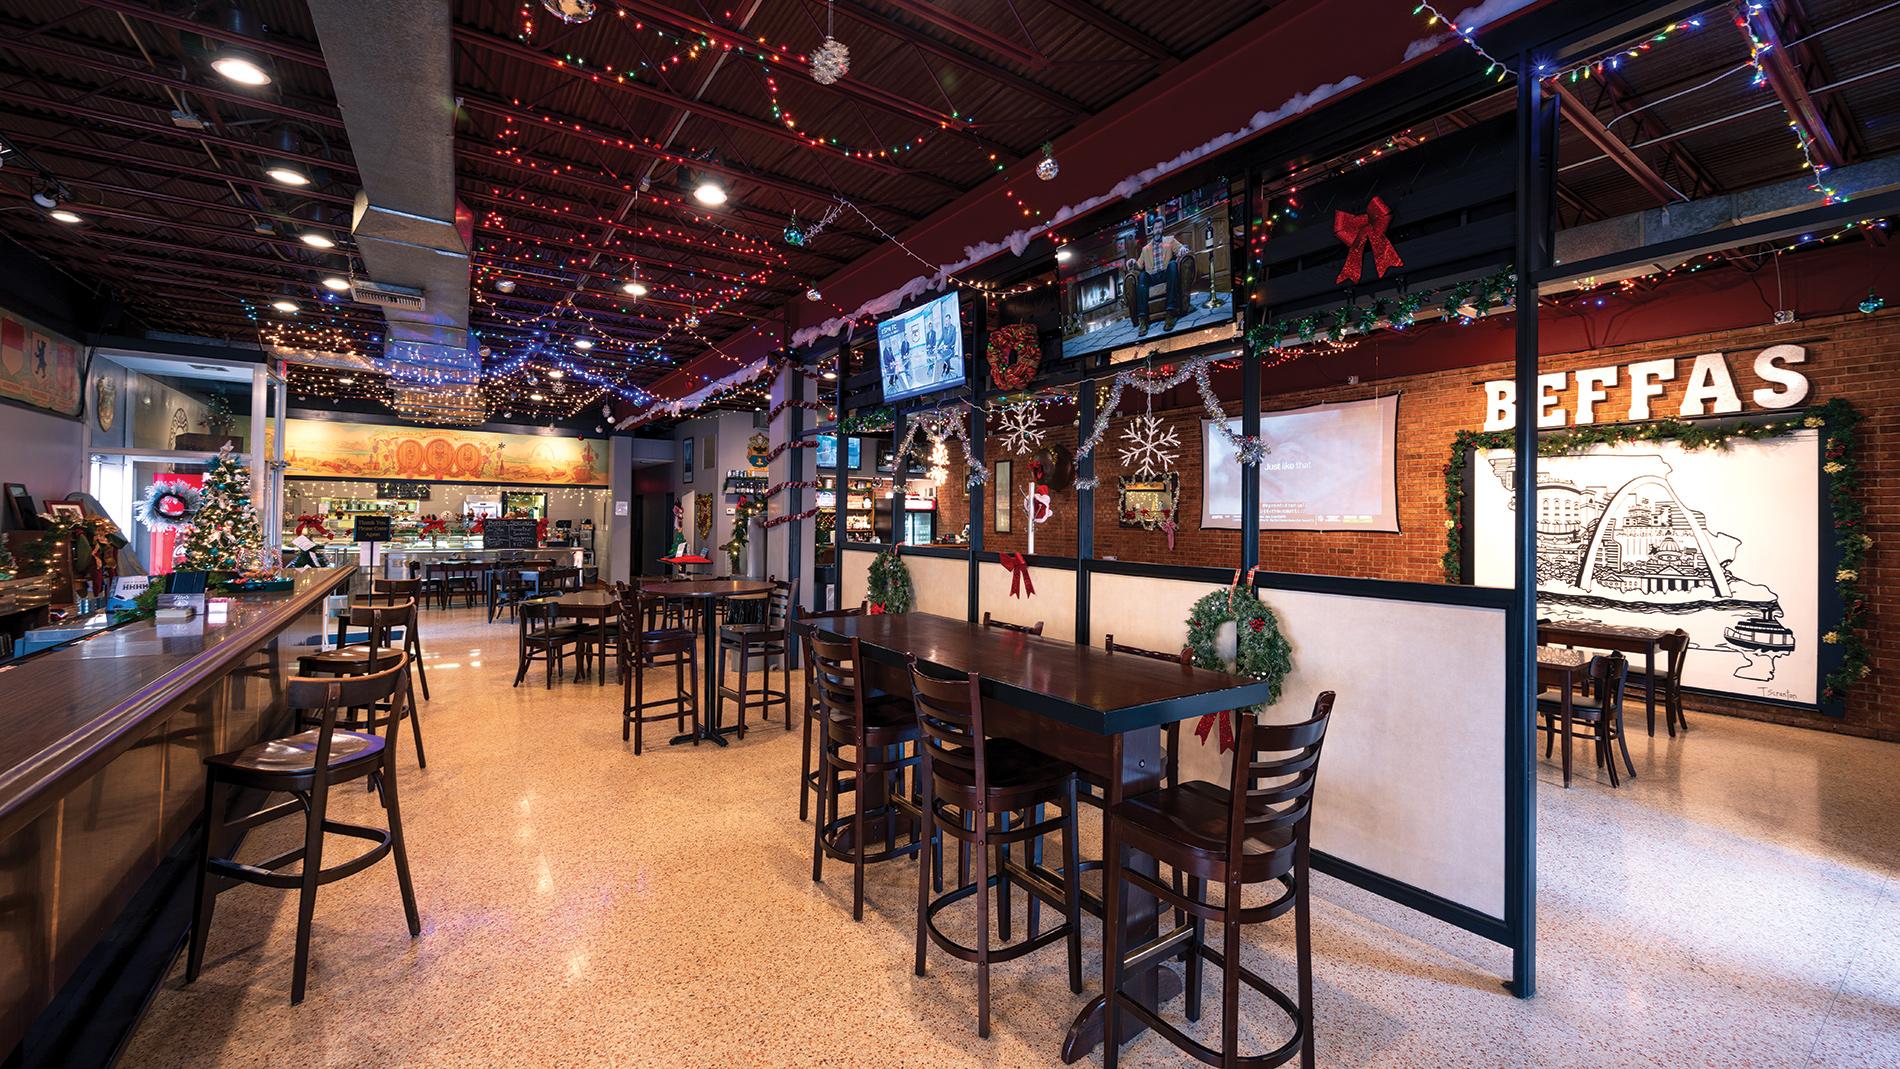 Beffa's Bar & Restaurant in st. louis